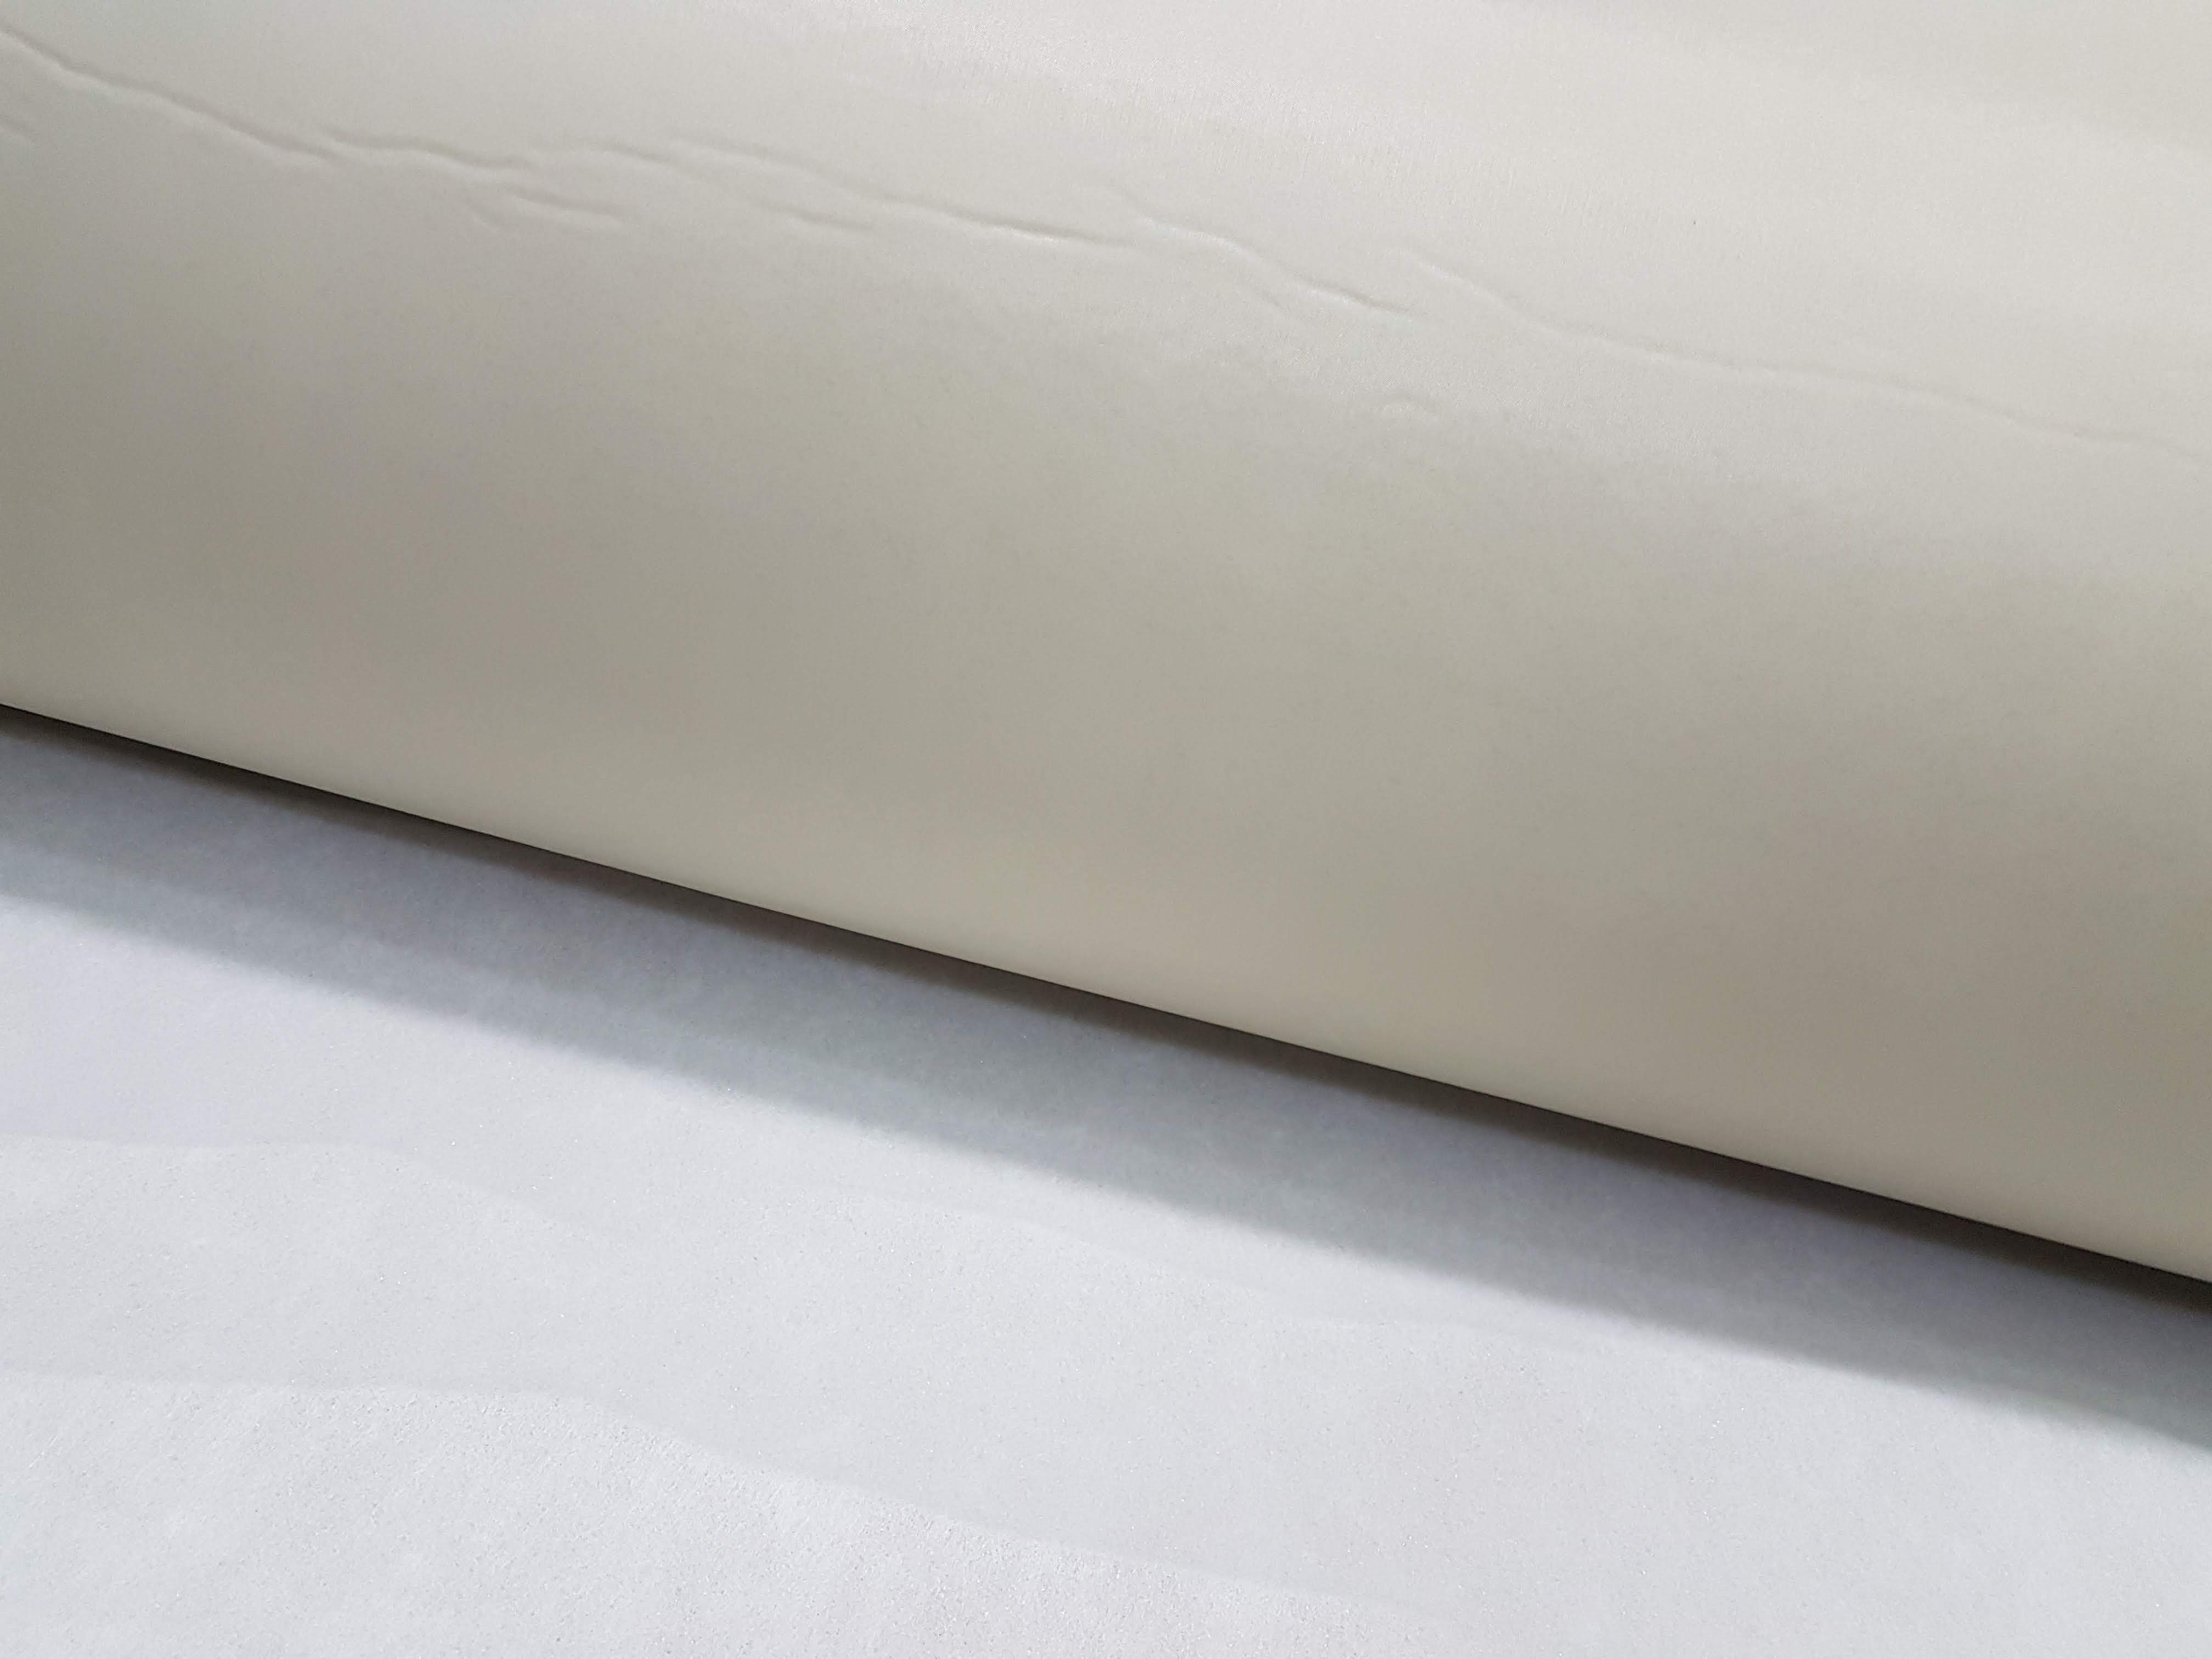 Nylon Dublado (Acoplado) Bege